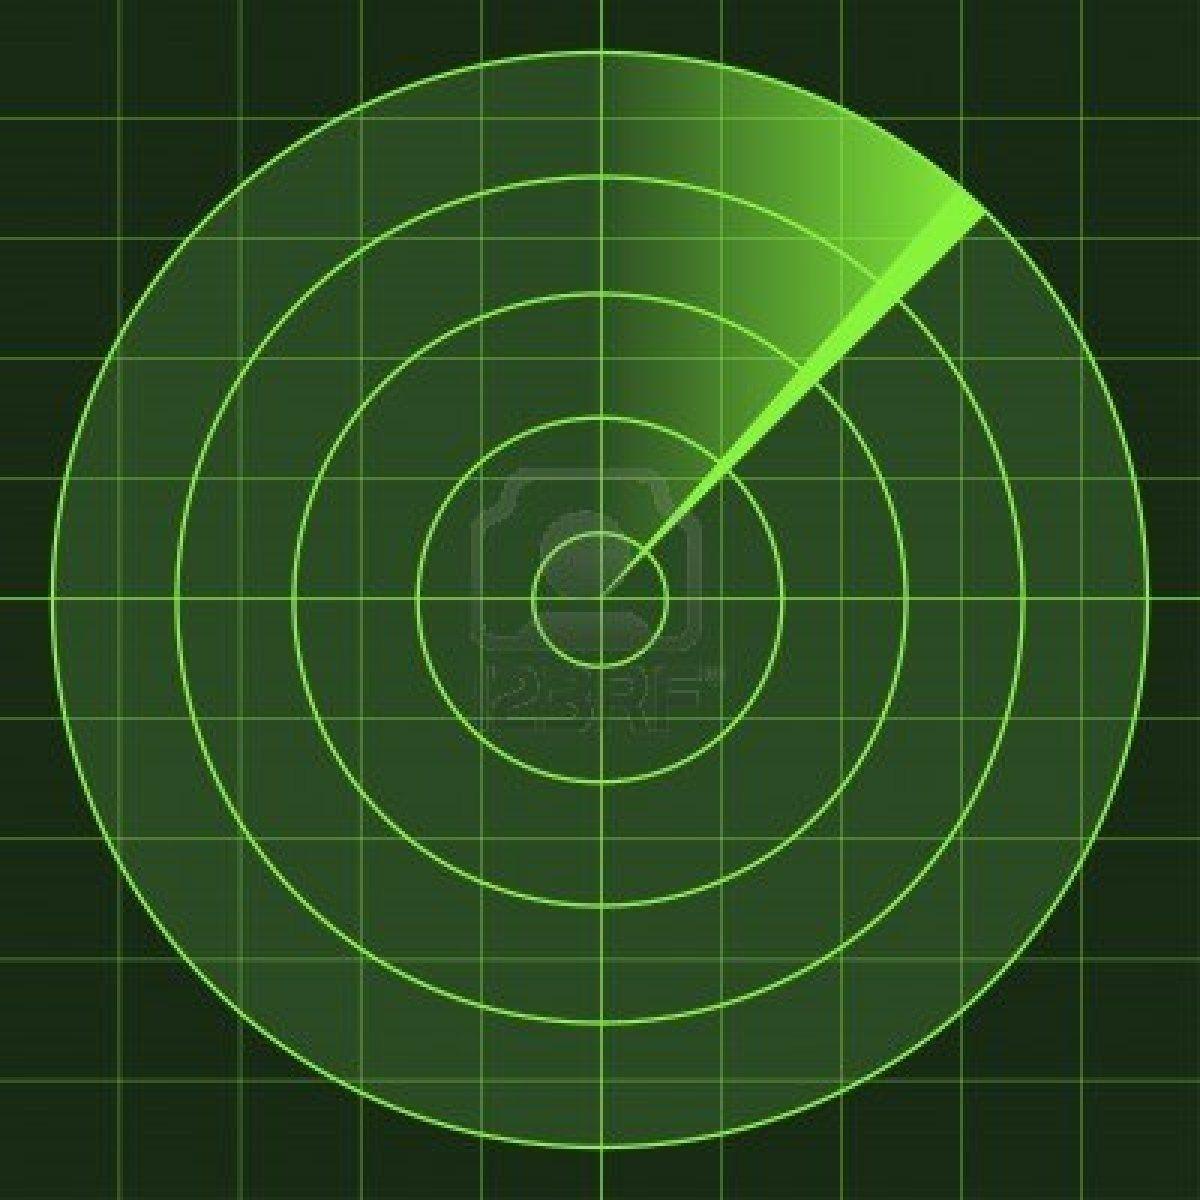 Sound Reflection Sonar Wave Ultrasonic transducer, radar, angle, text png |  PNGEgg